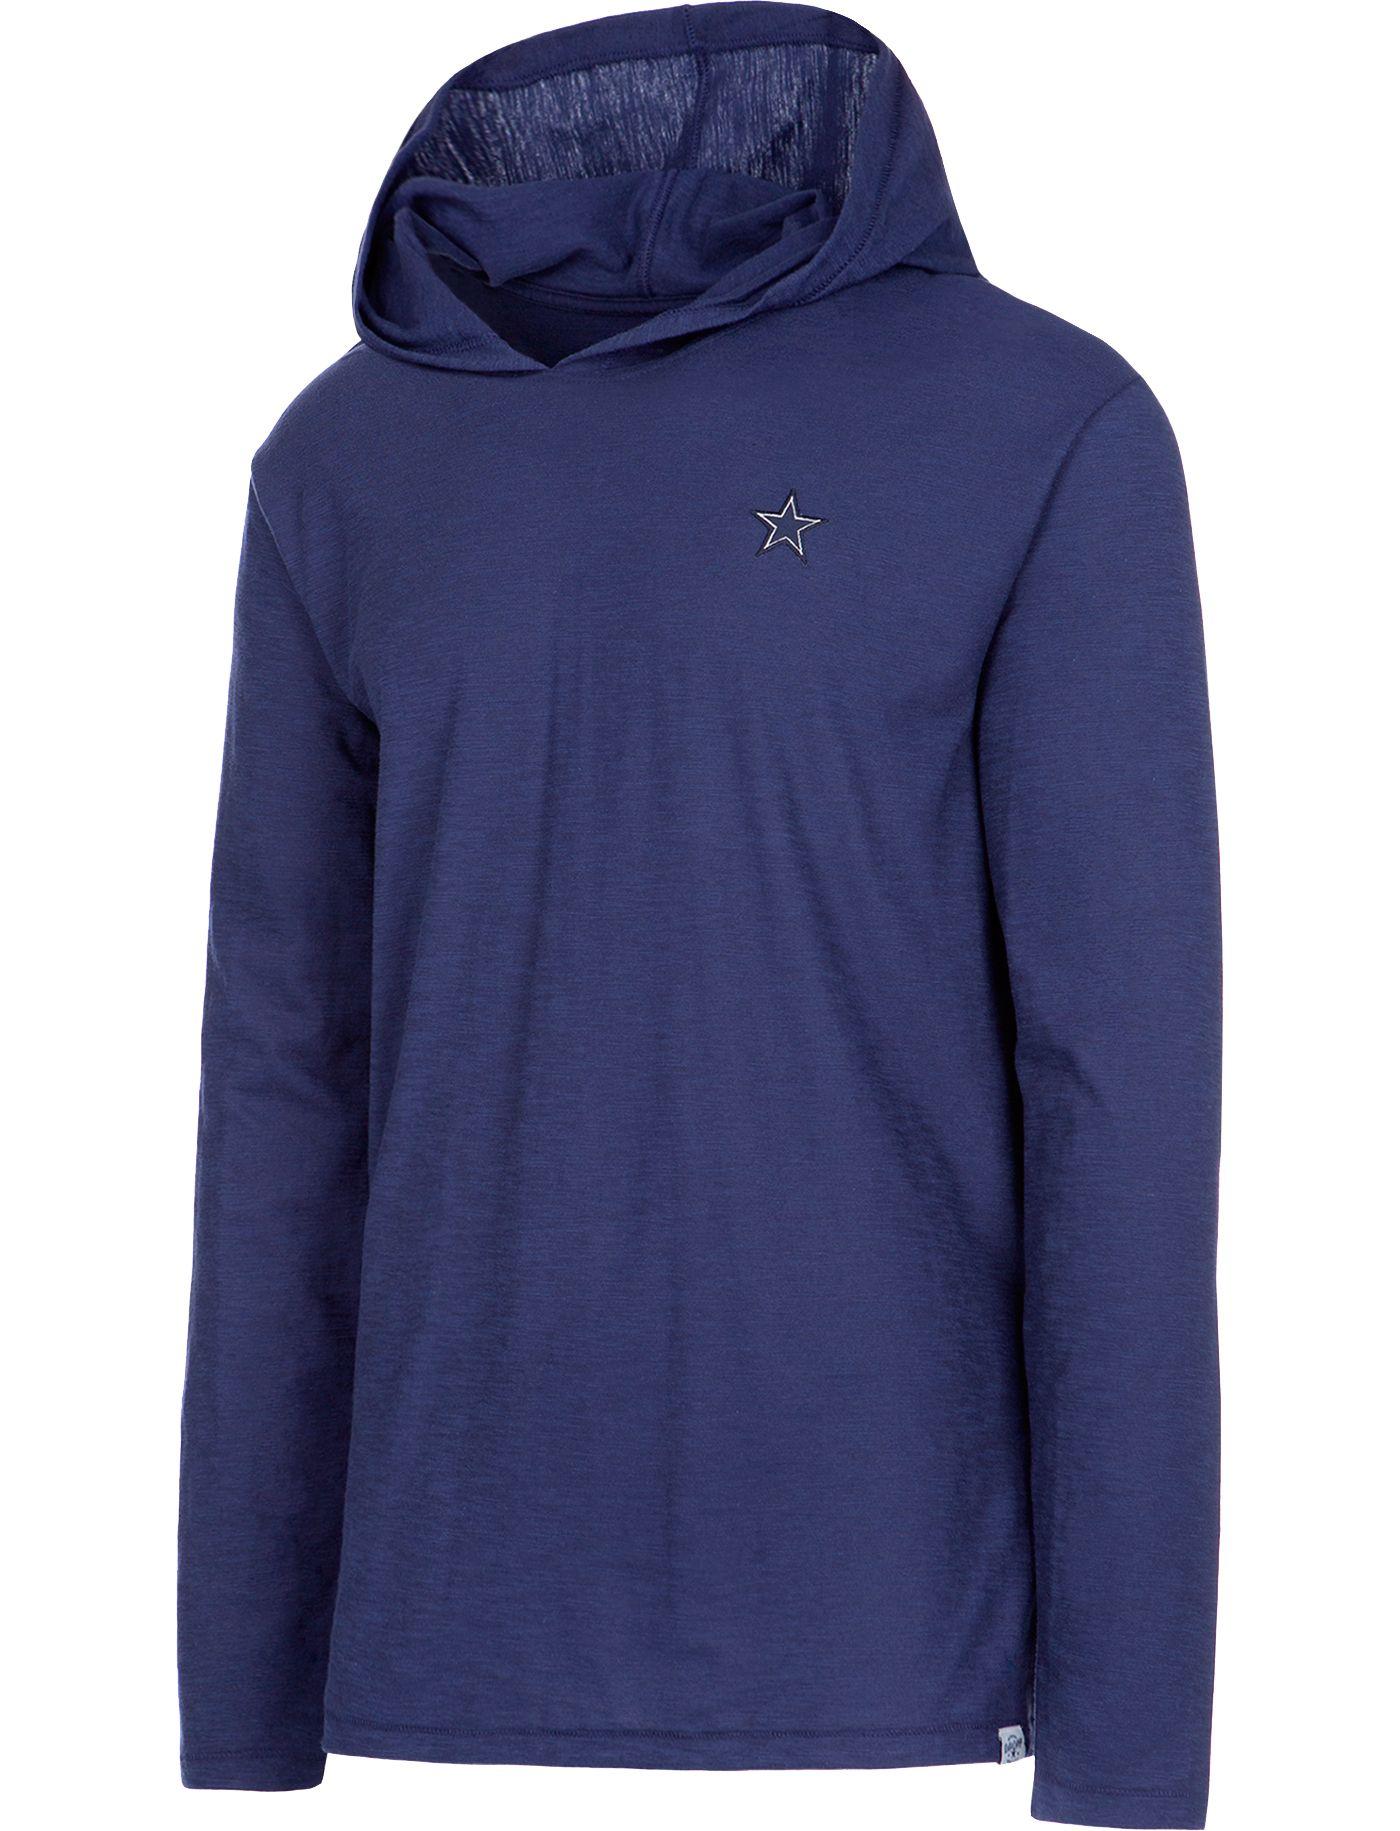 Dallas Cowboys Merchandising Men's Waylon Navy Hooded Long Sleeve Shirt